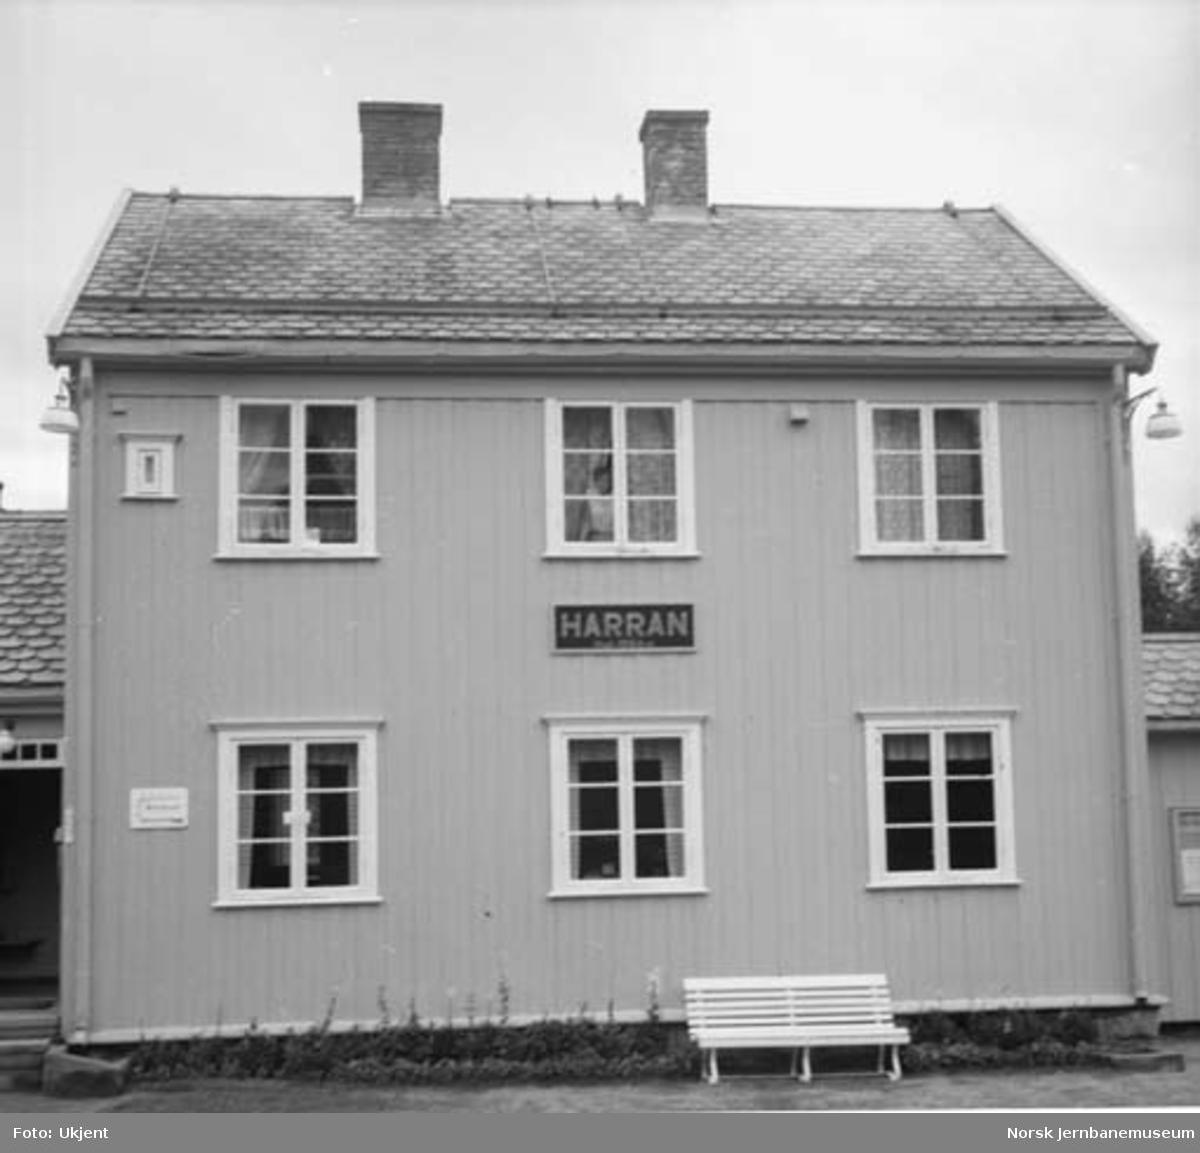 Harran stasjon